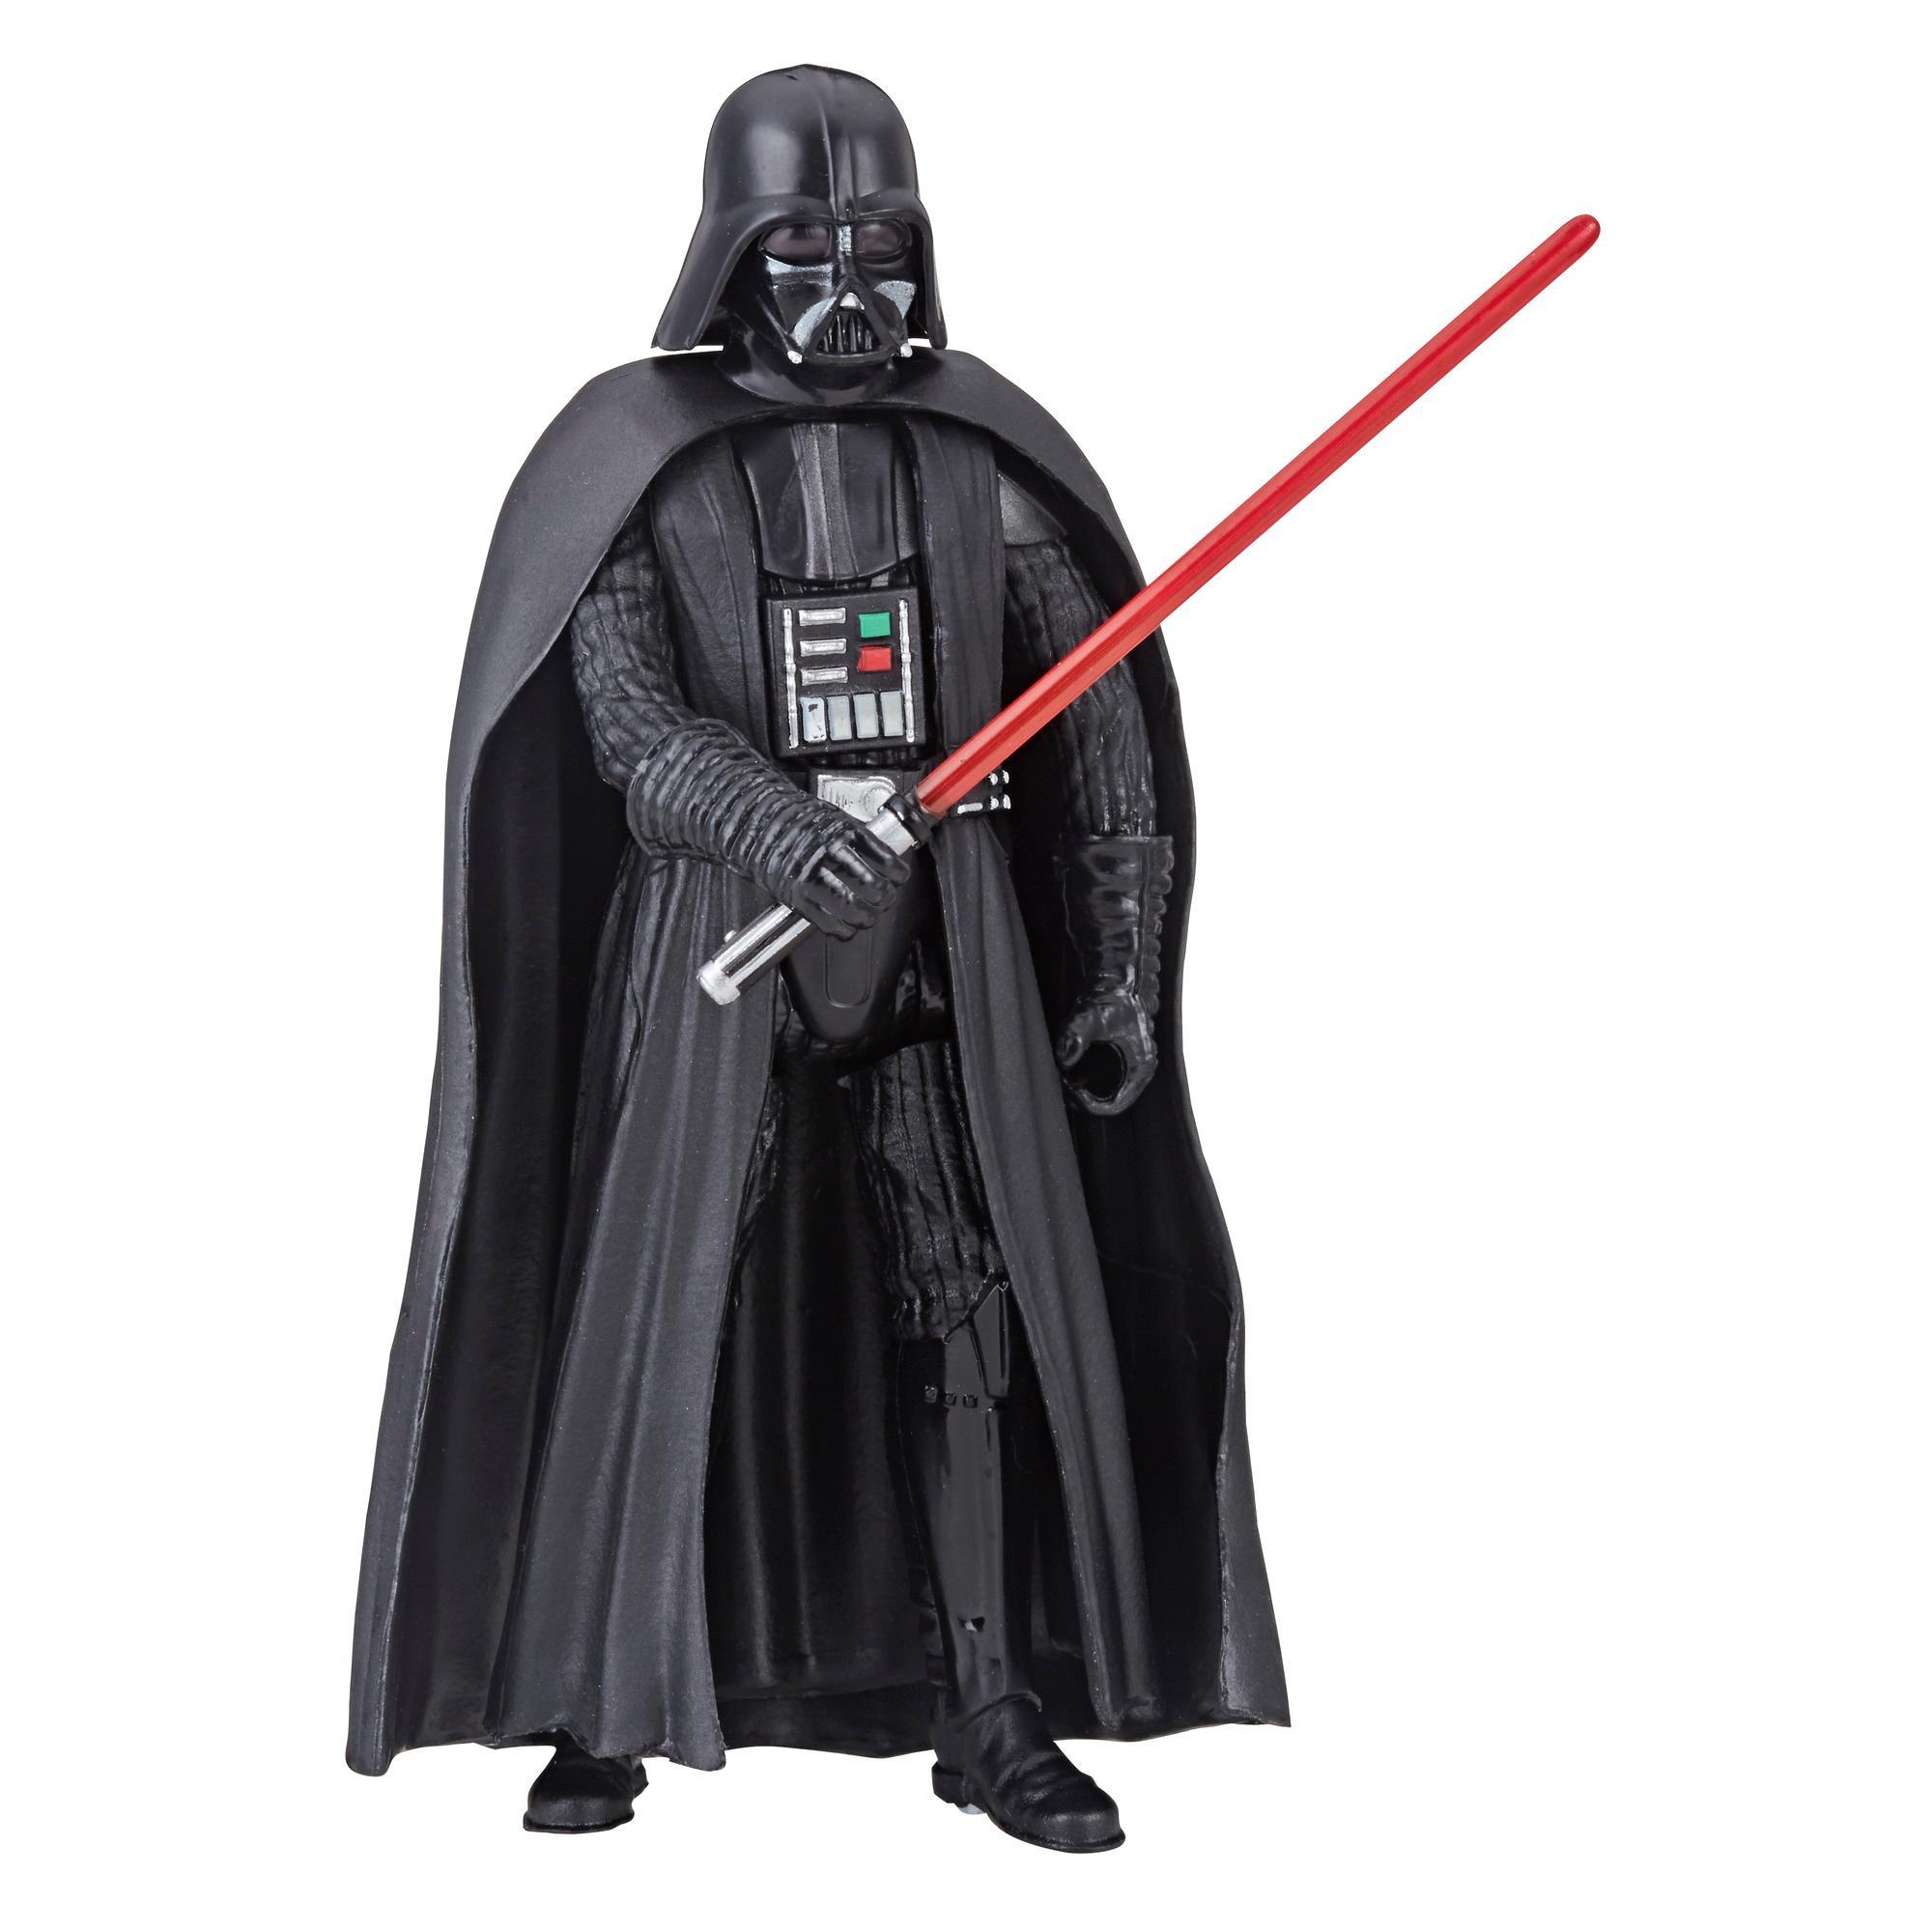 Star Wars Galaxy of Adventures Darth Vader Figür